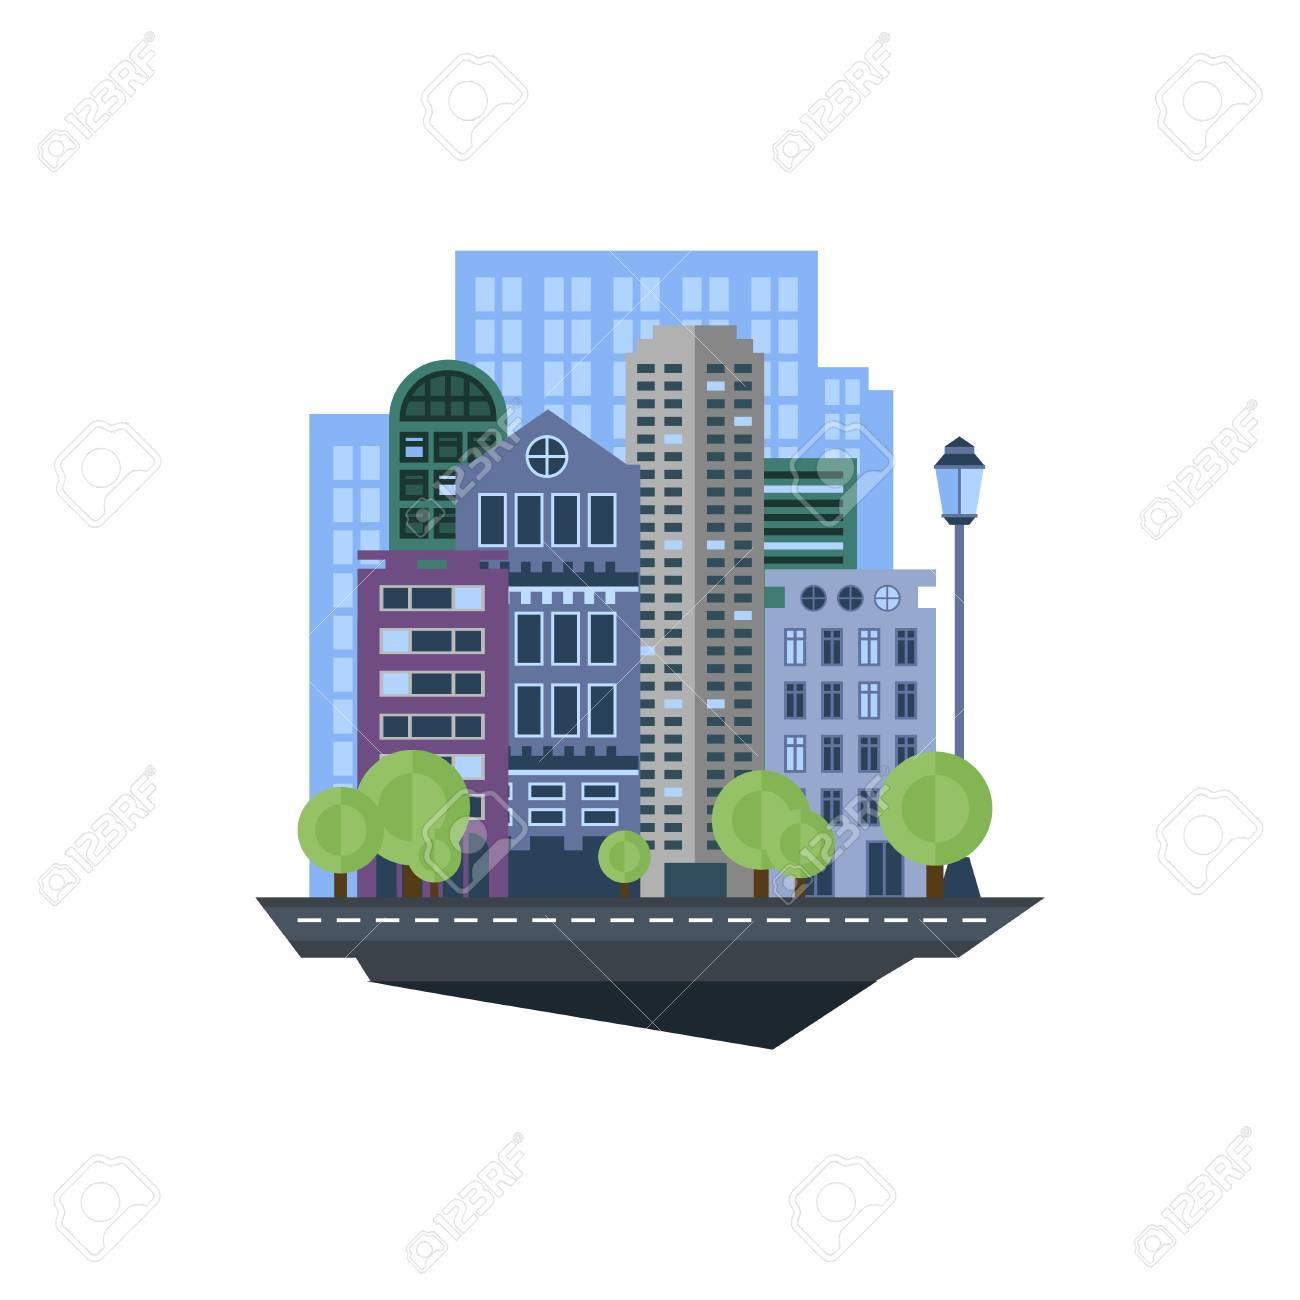 Modern Urban Landscape. - 50570016